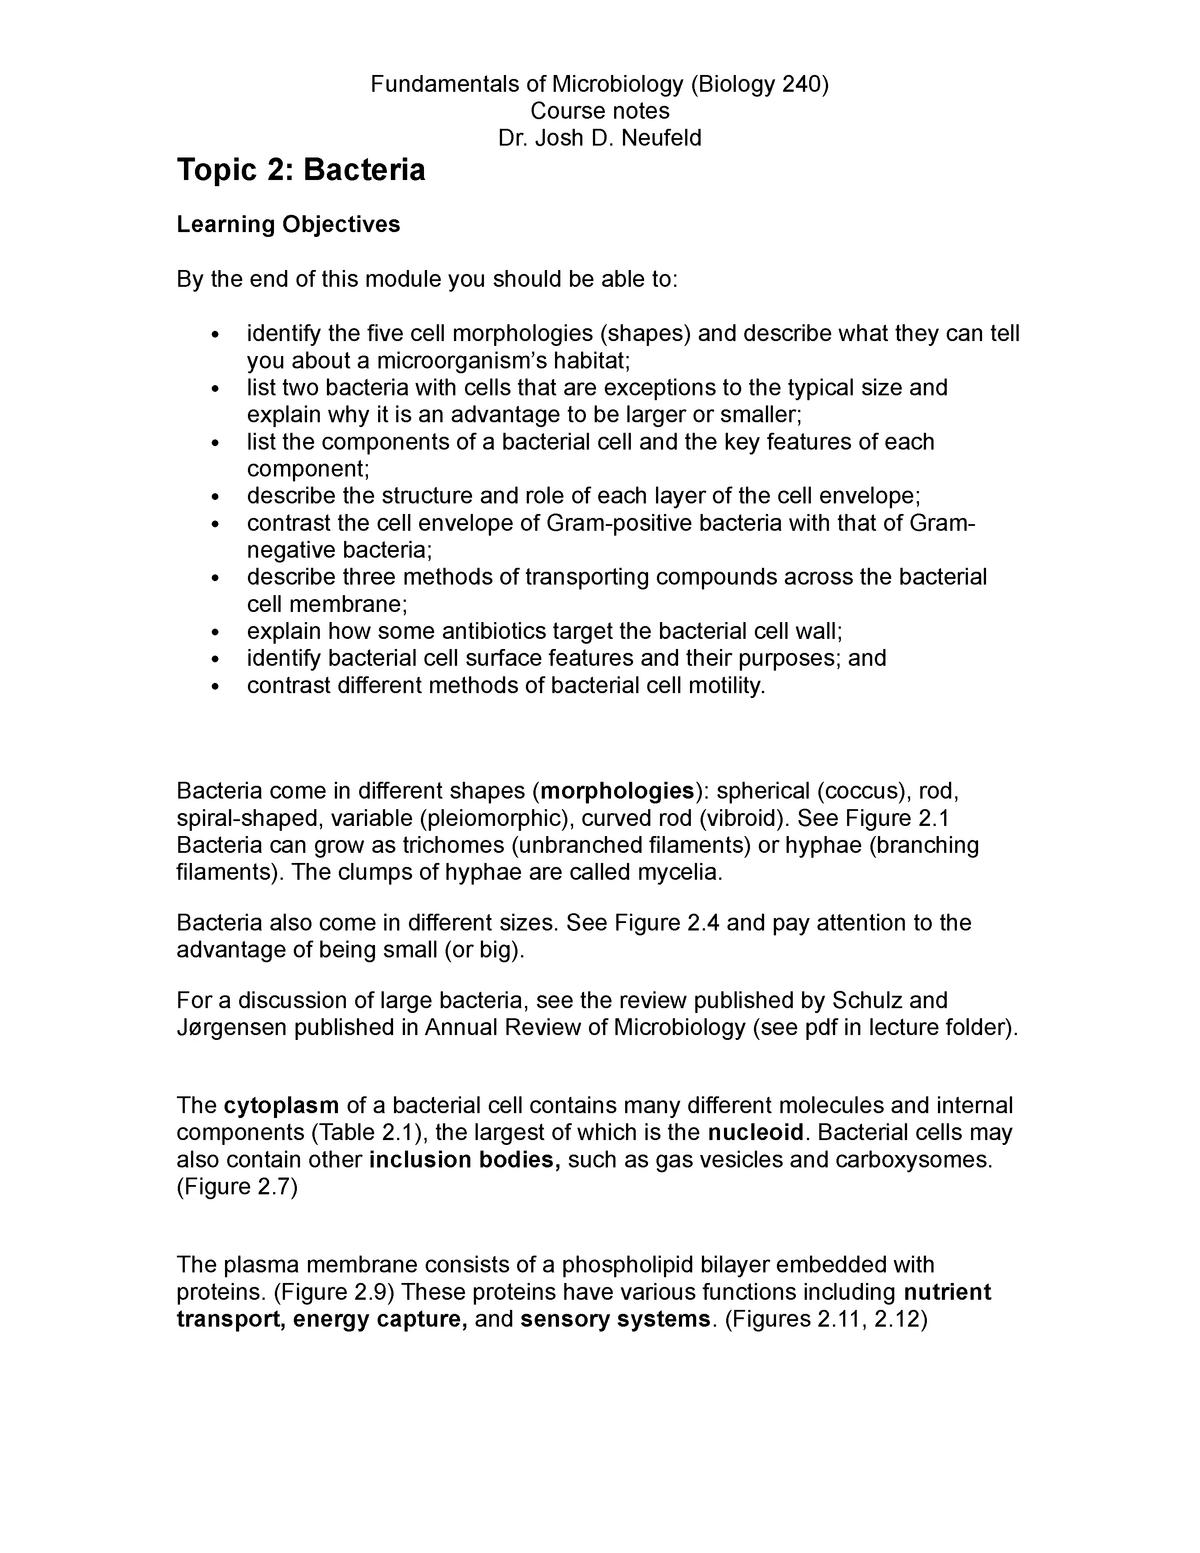 Topic 2 notes - Biol 240: Fundamentals of Microbiology - StuDocu